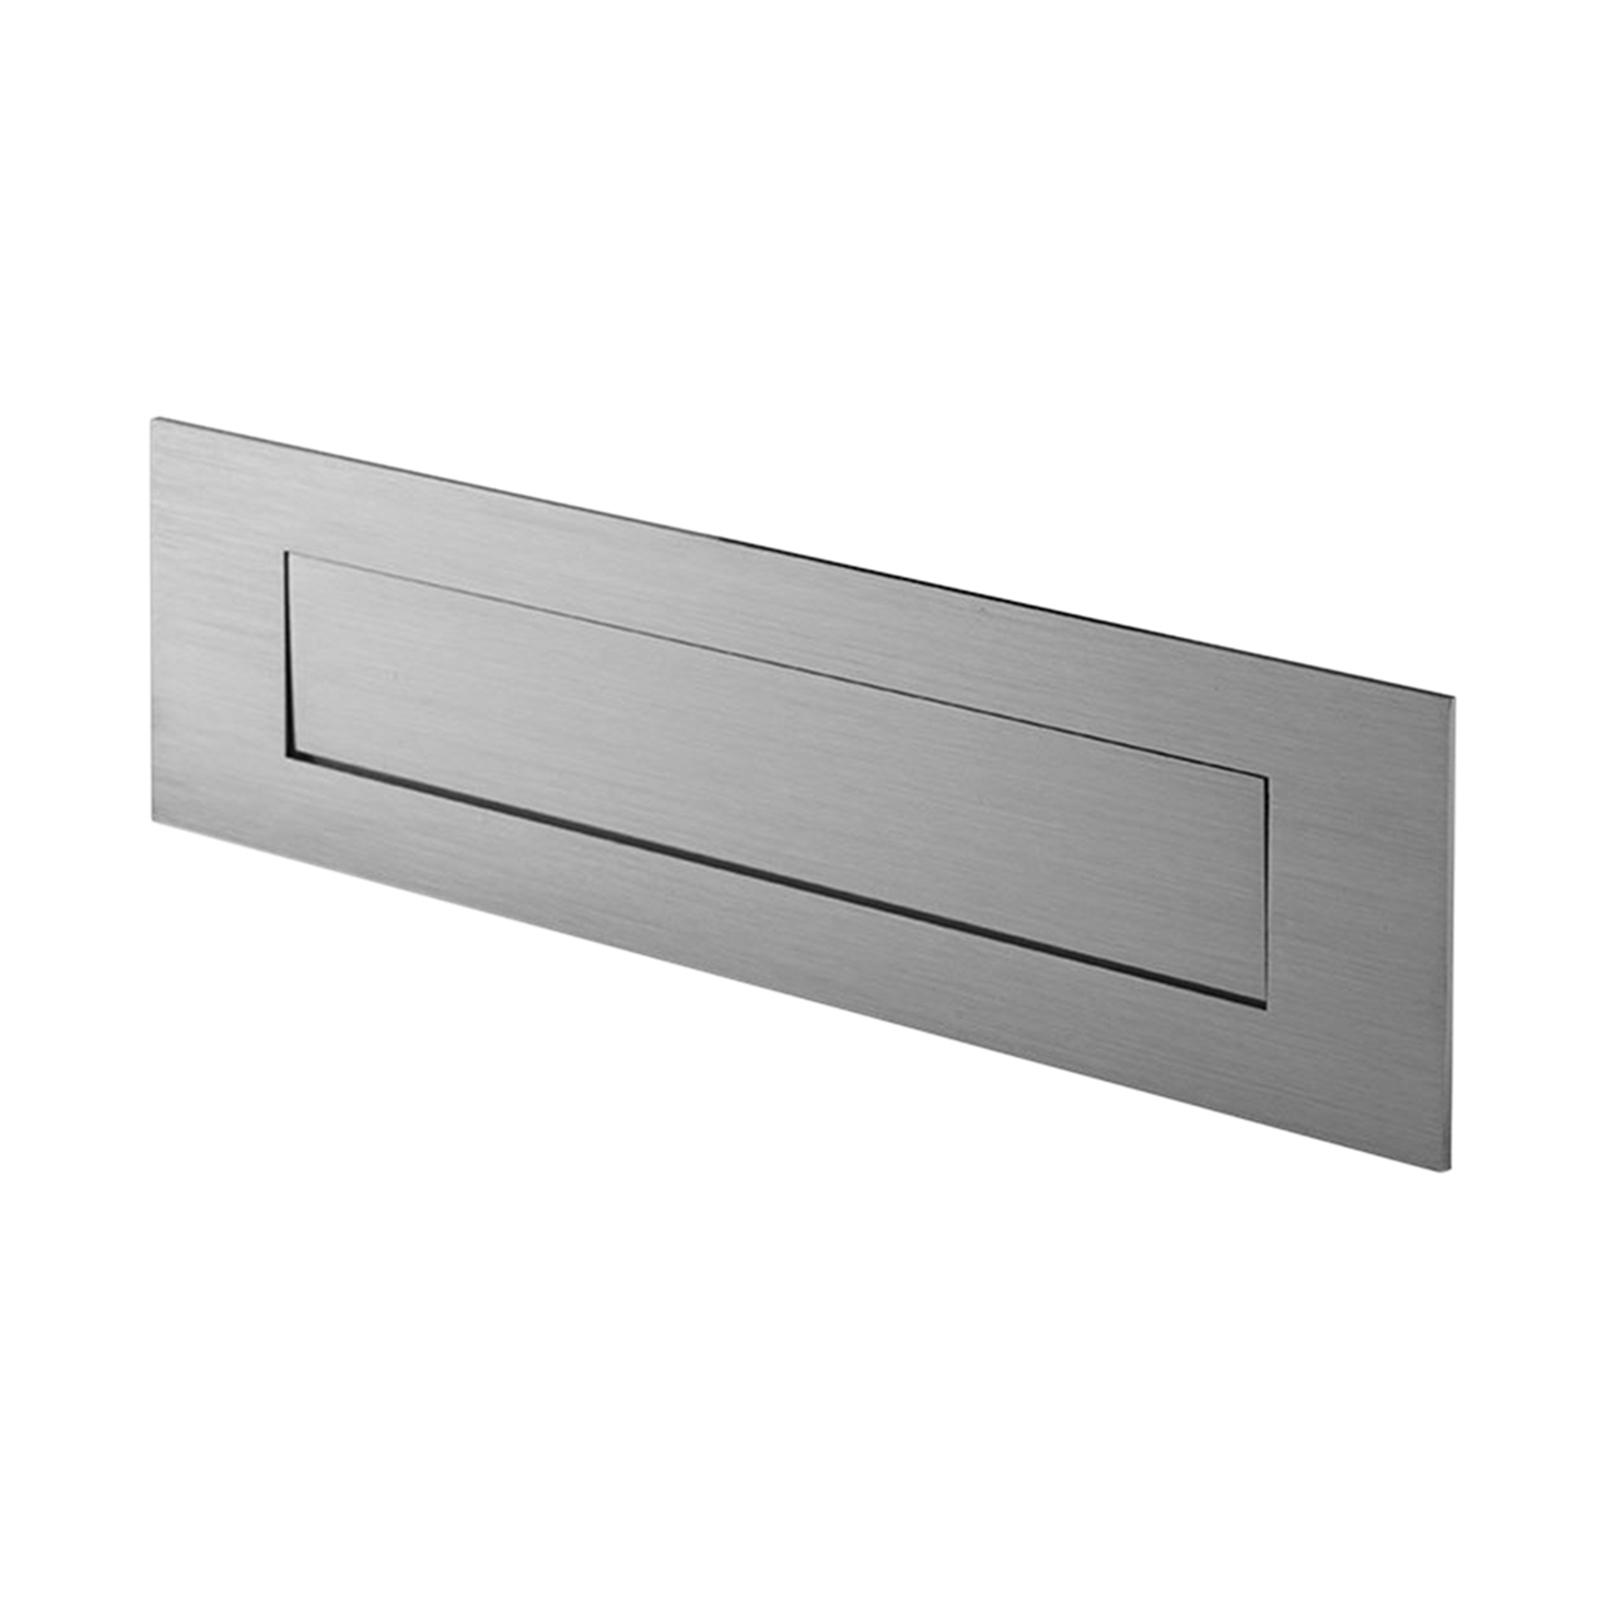 Sandleford 250mm Stainless Steel Letter Plate